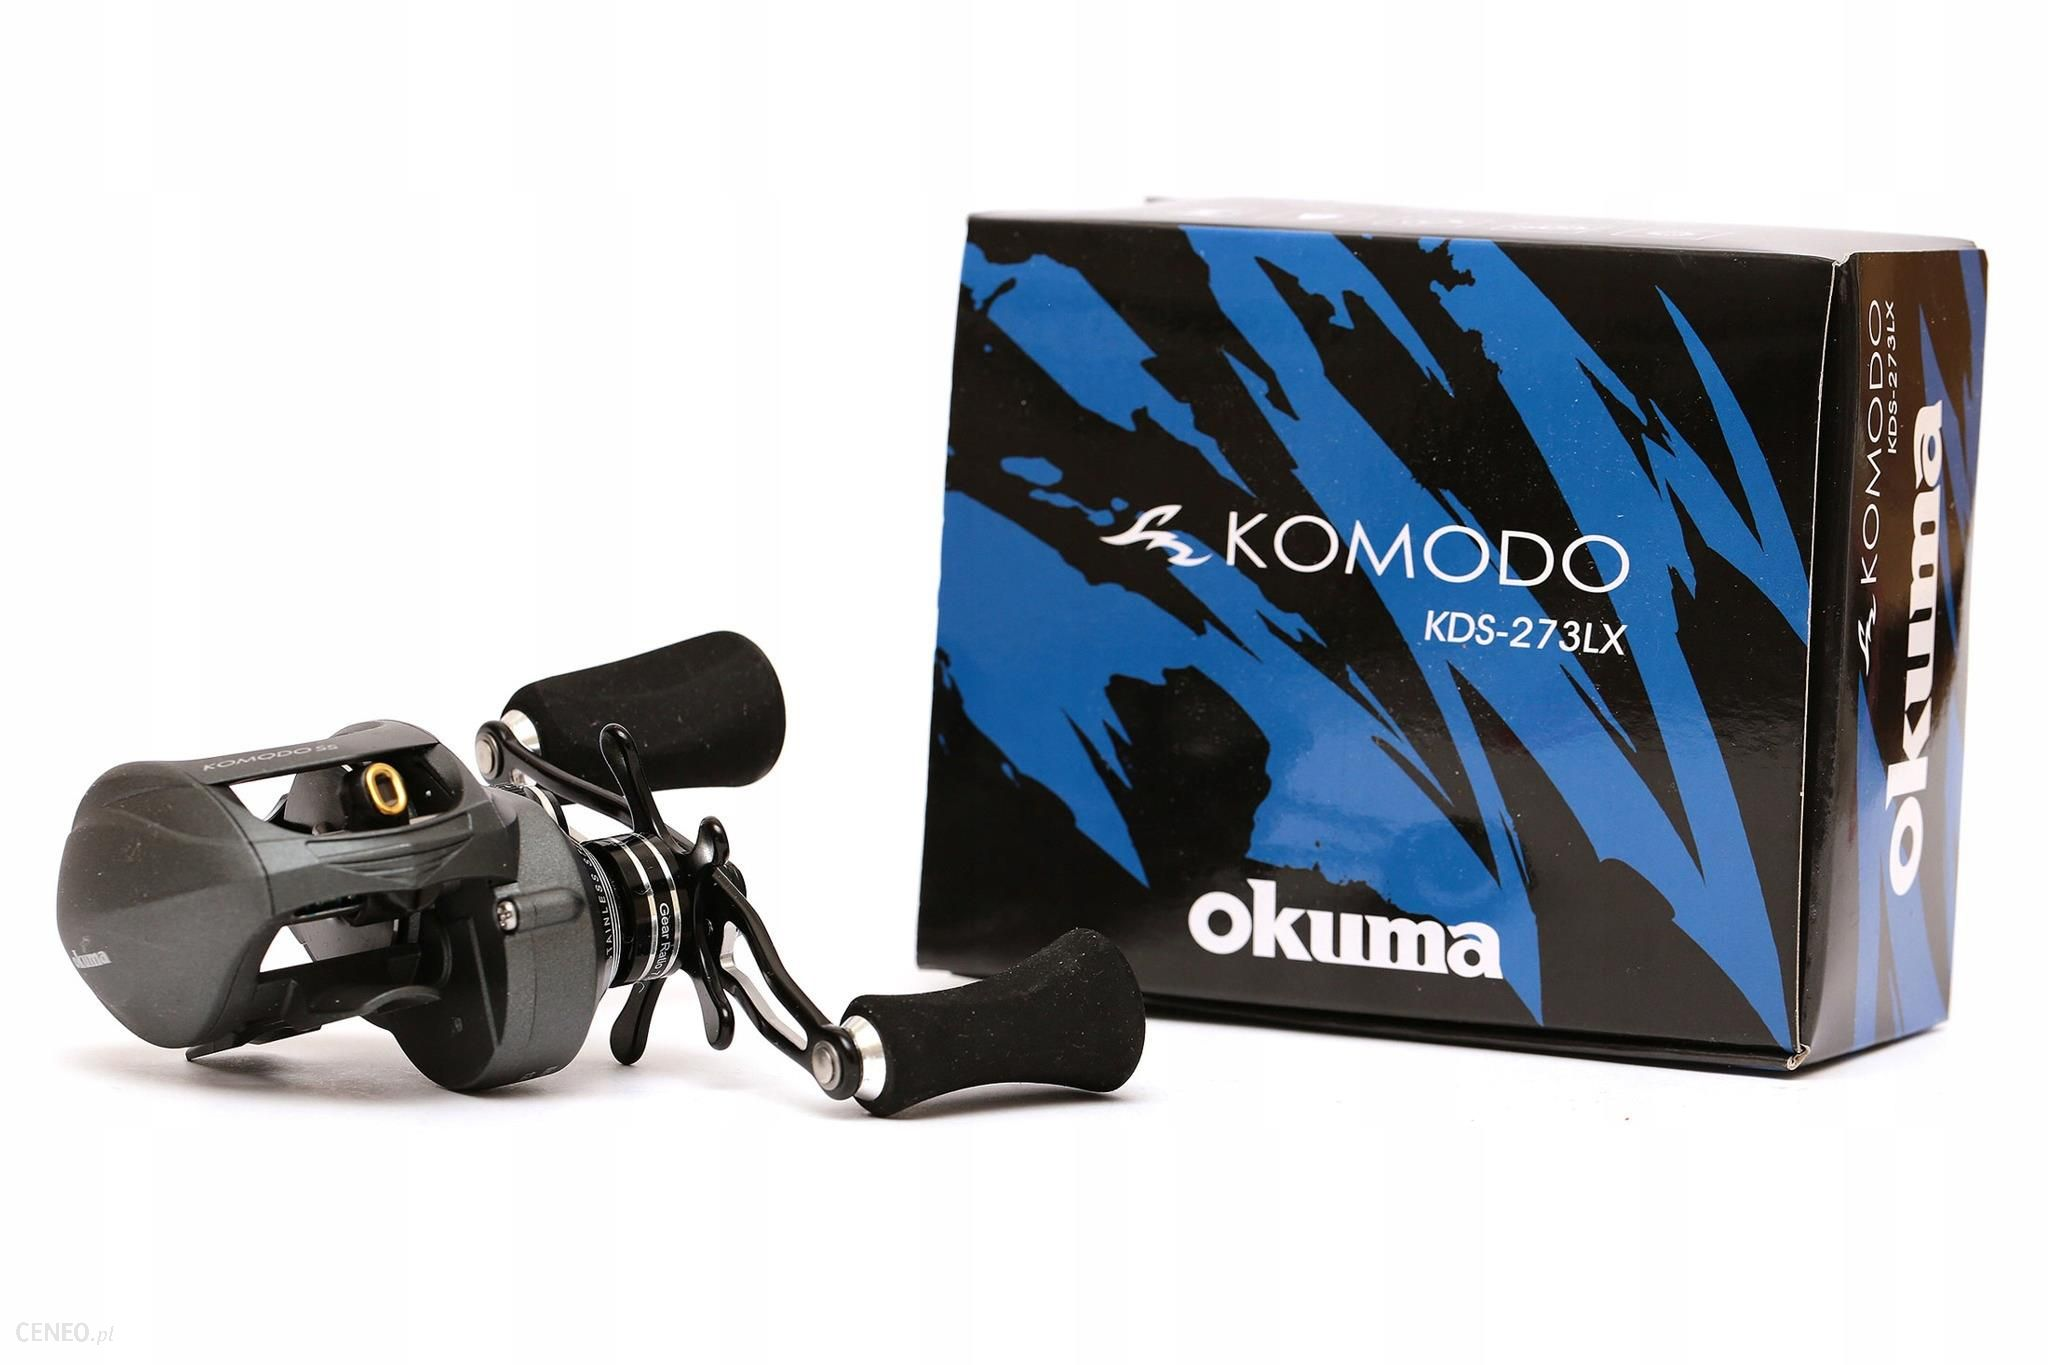 Mocny Multiplikator Okuma Komodo KDS-273 LX